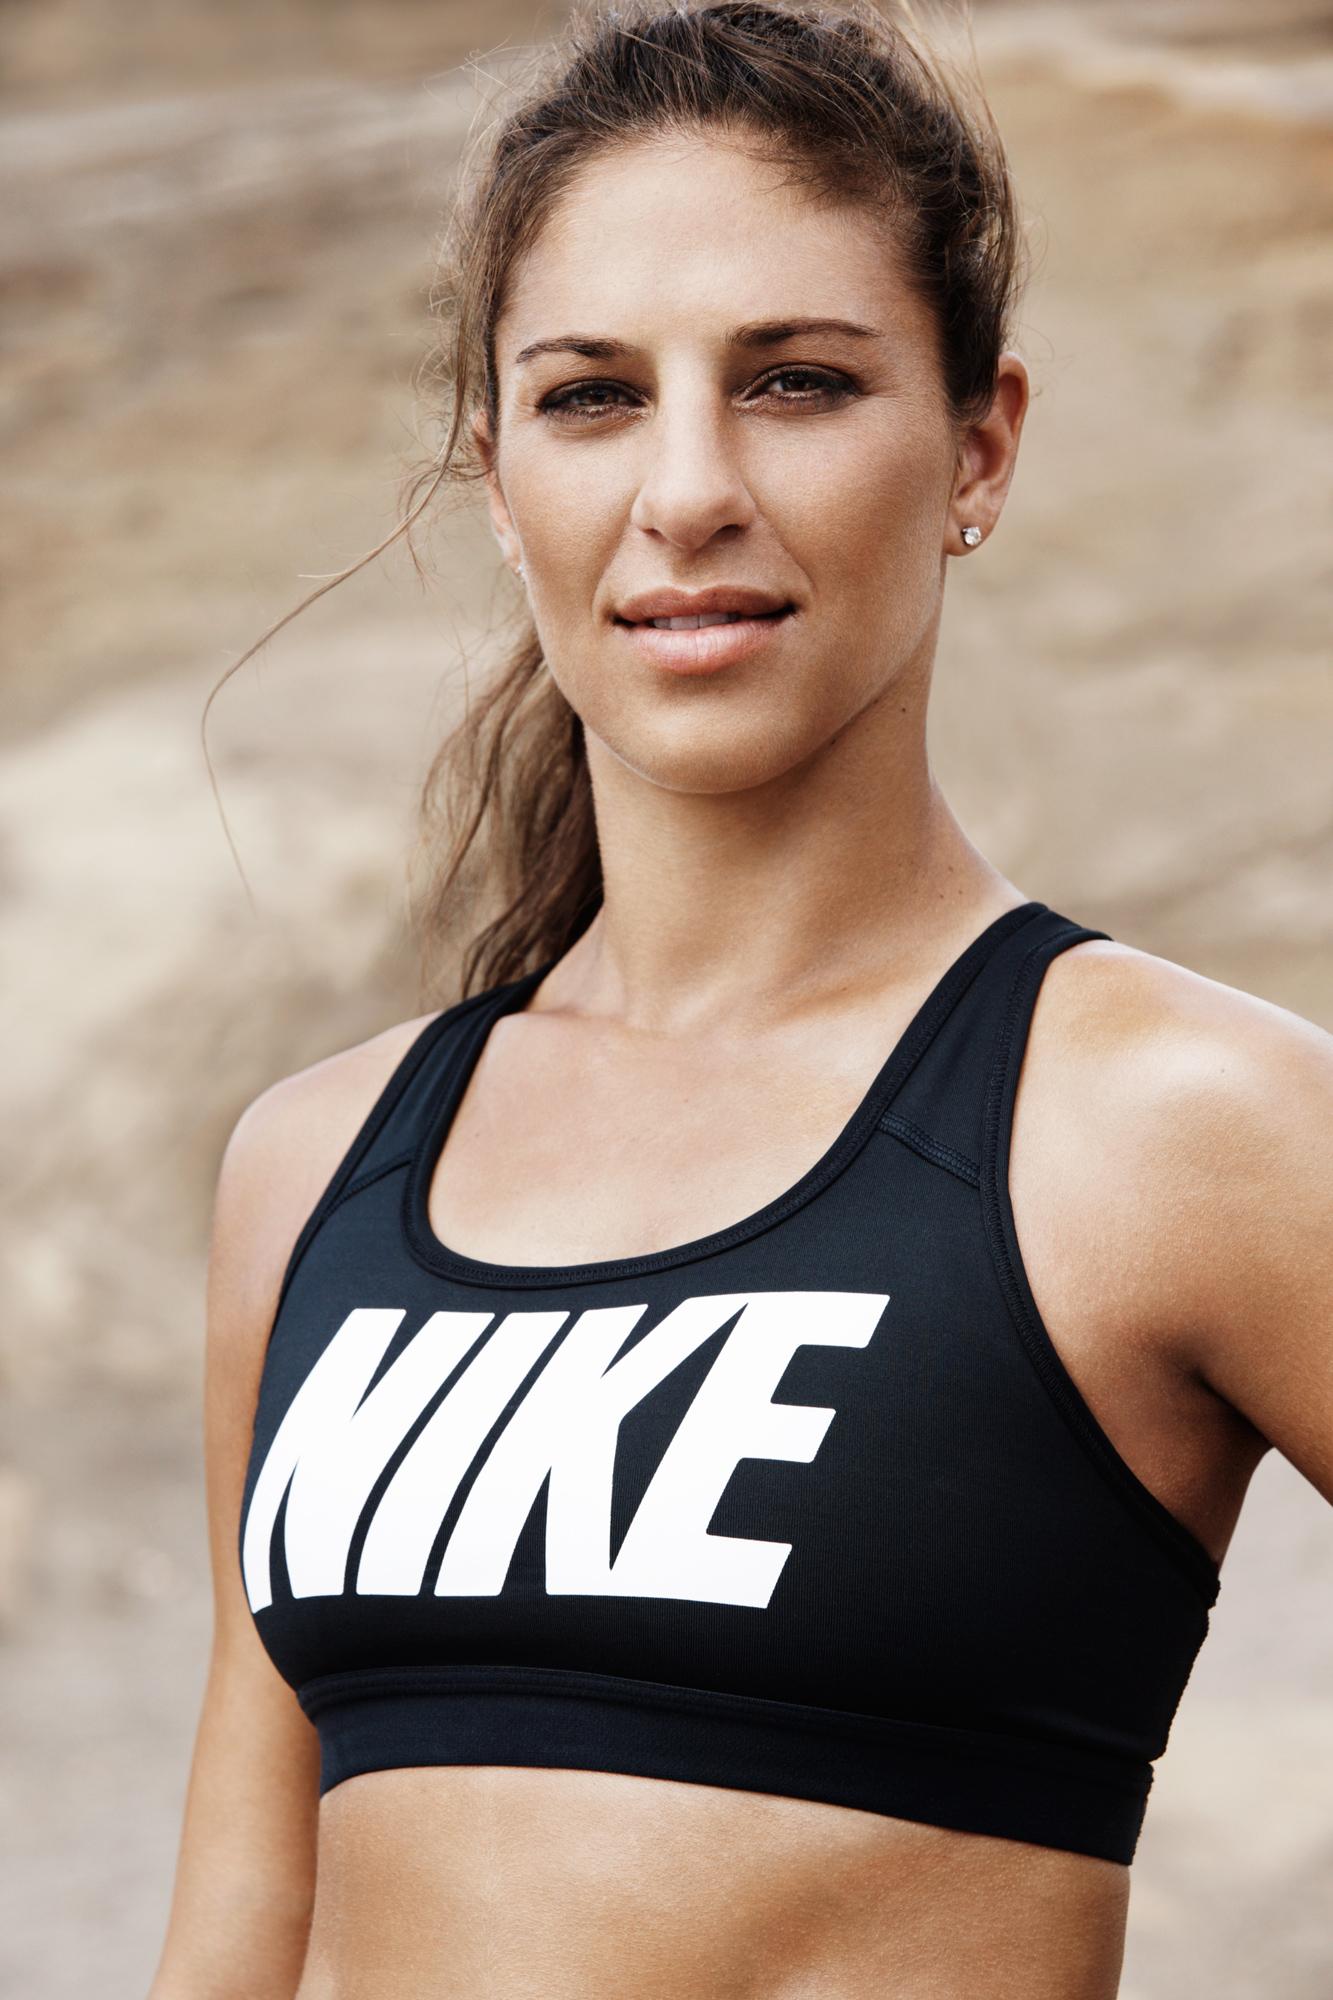 Nike Women Presents: U.S. National Team Midfielder Carli ...